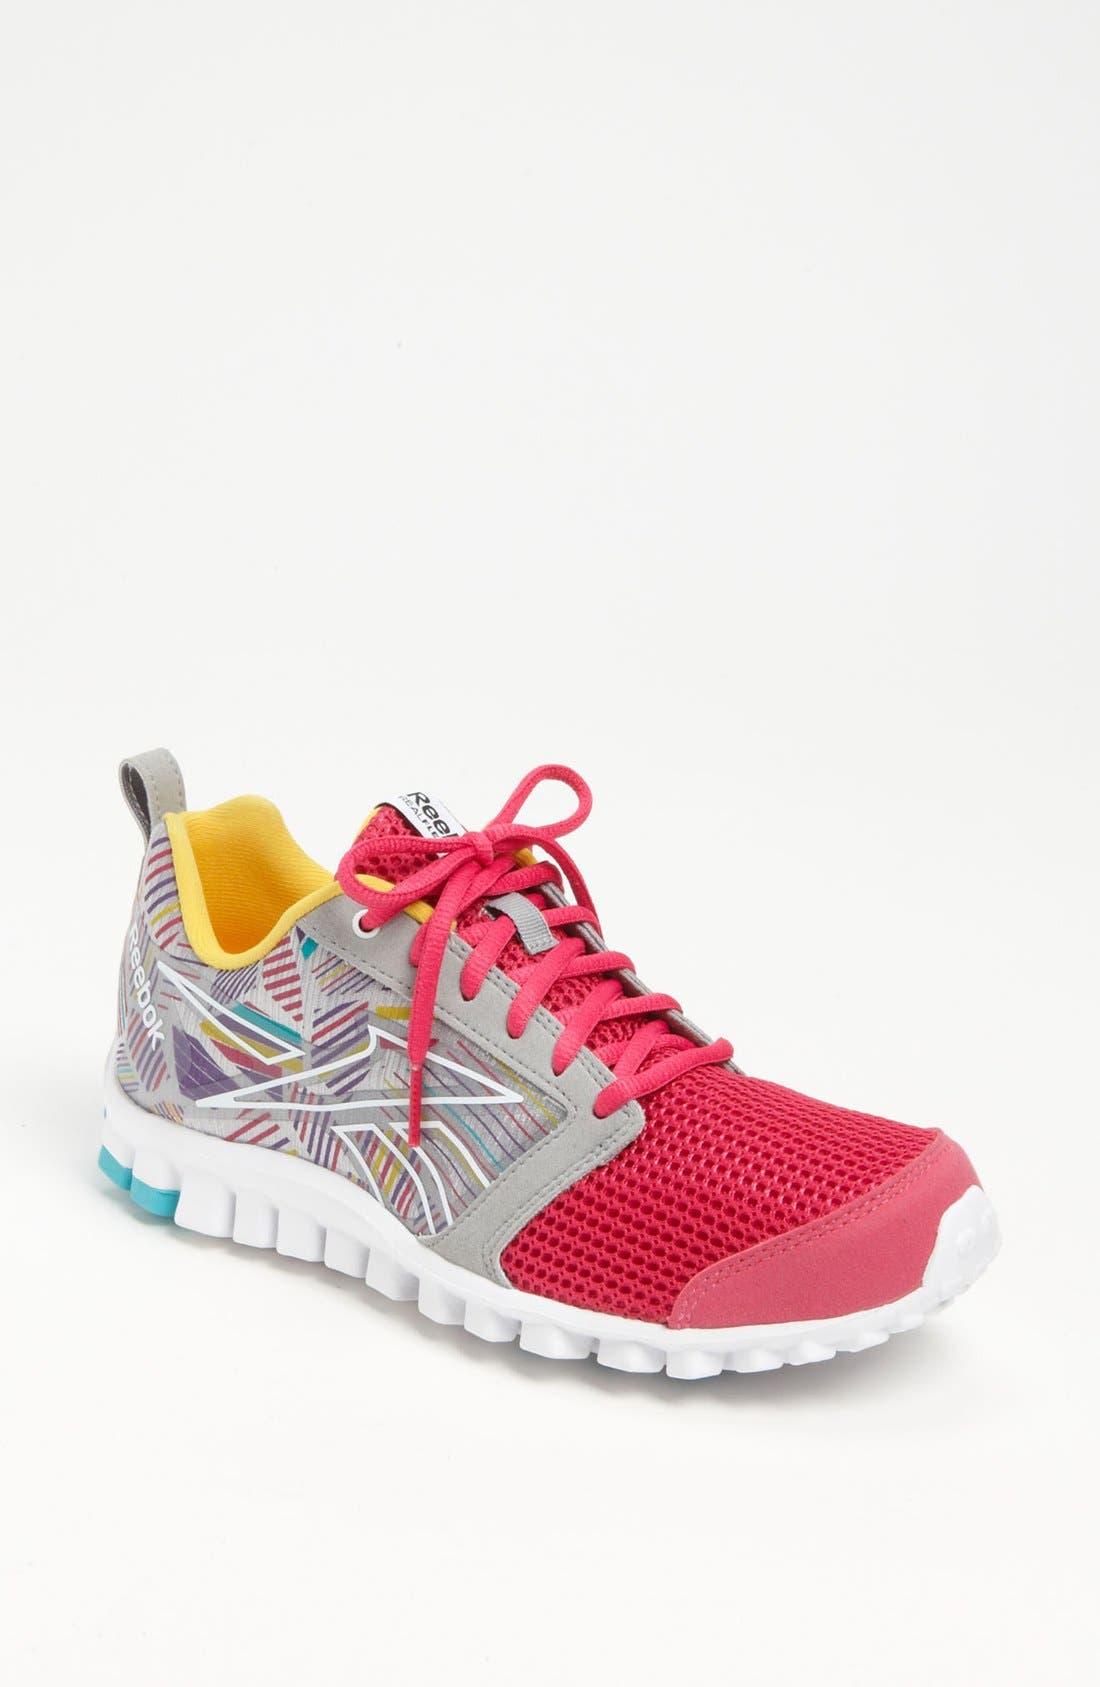 Alternate Image 1 Selected - Reebok 'RealFlex Scream 2.0' Running Shoe (Women)